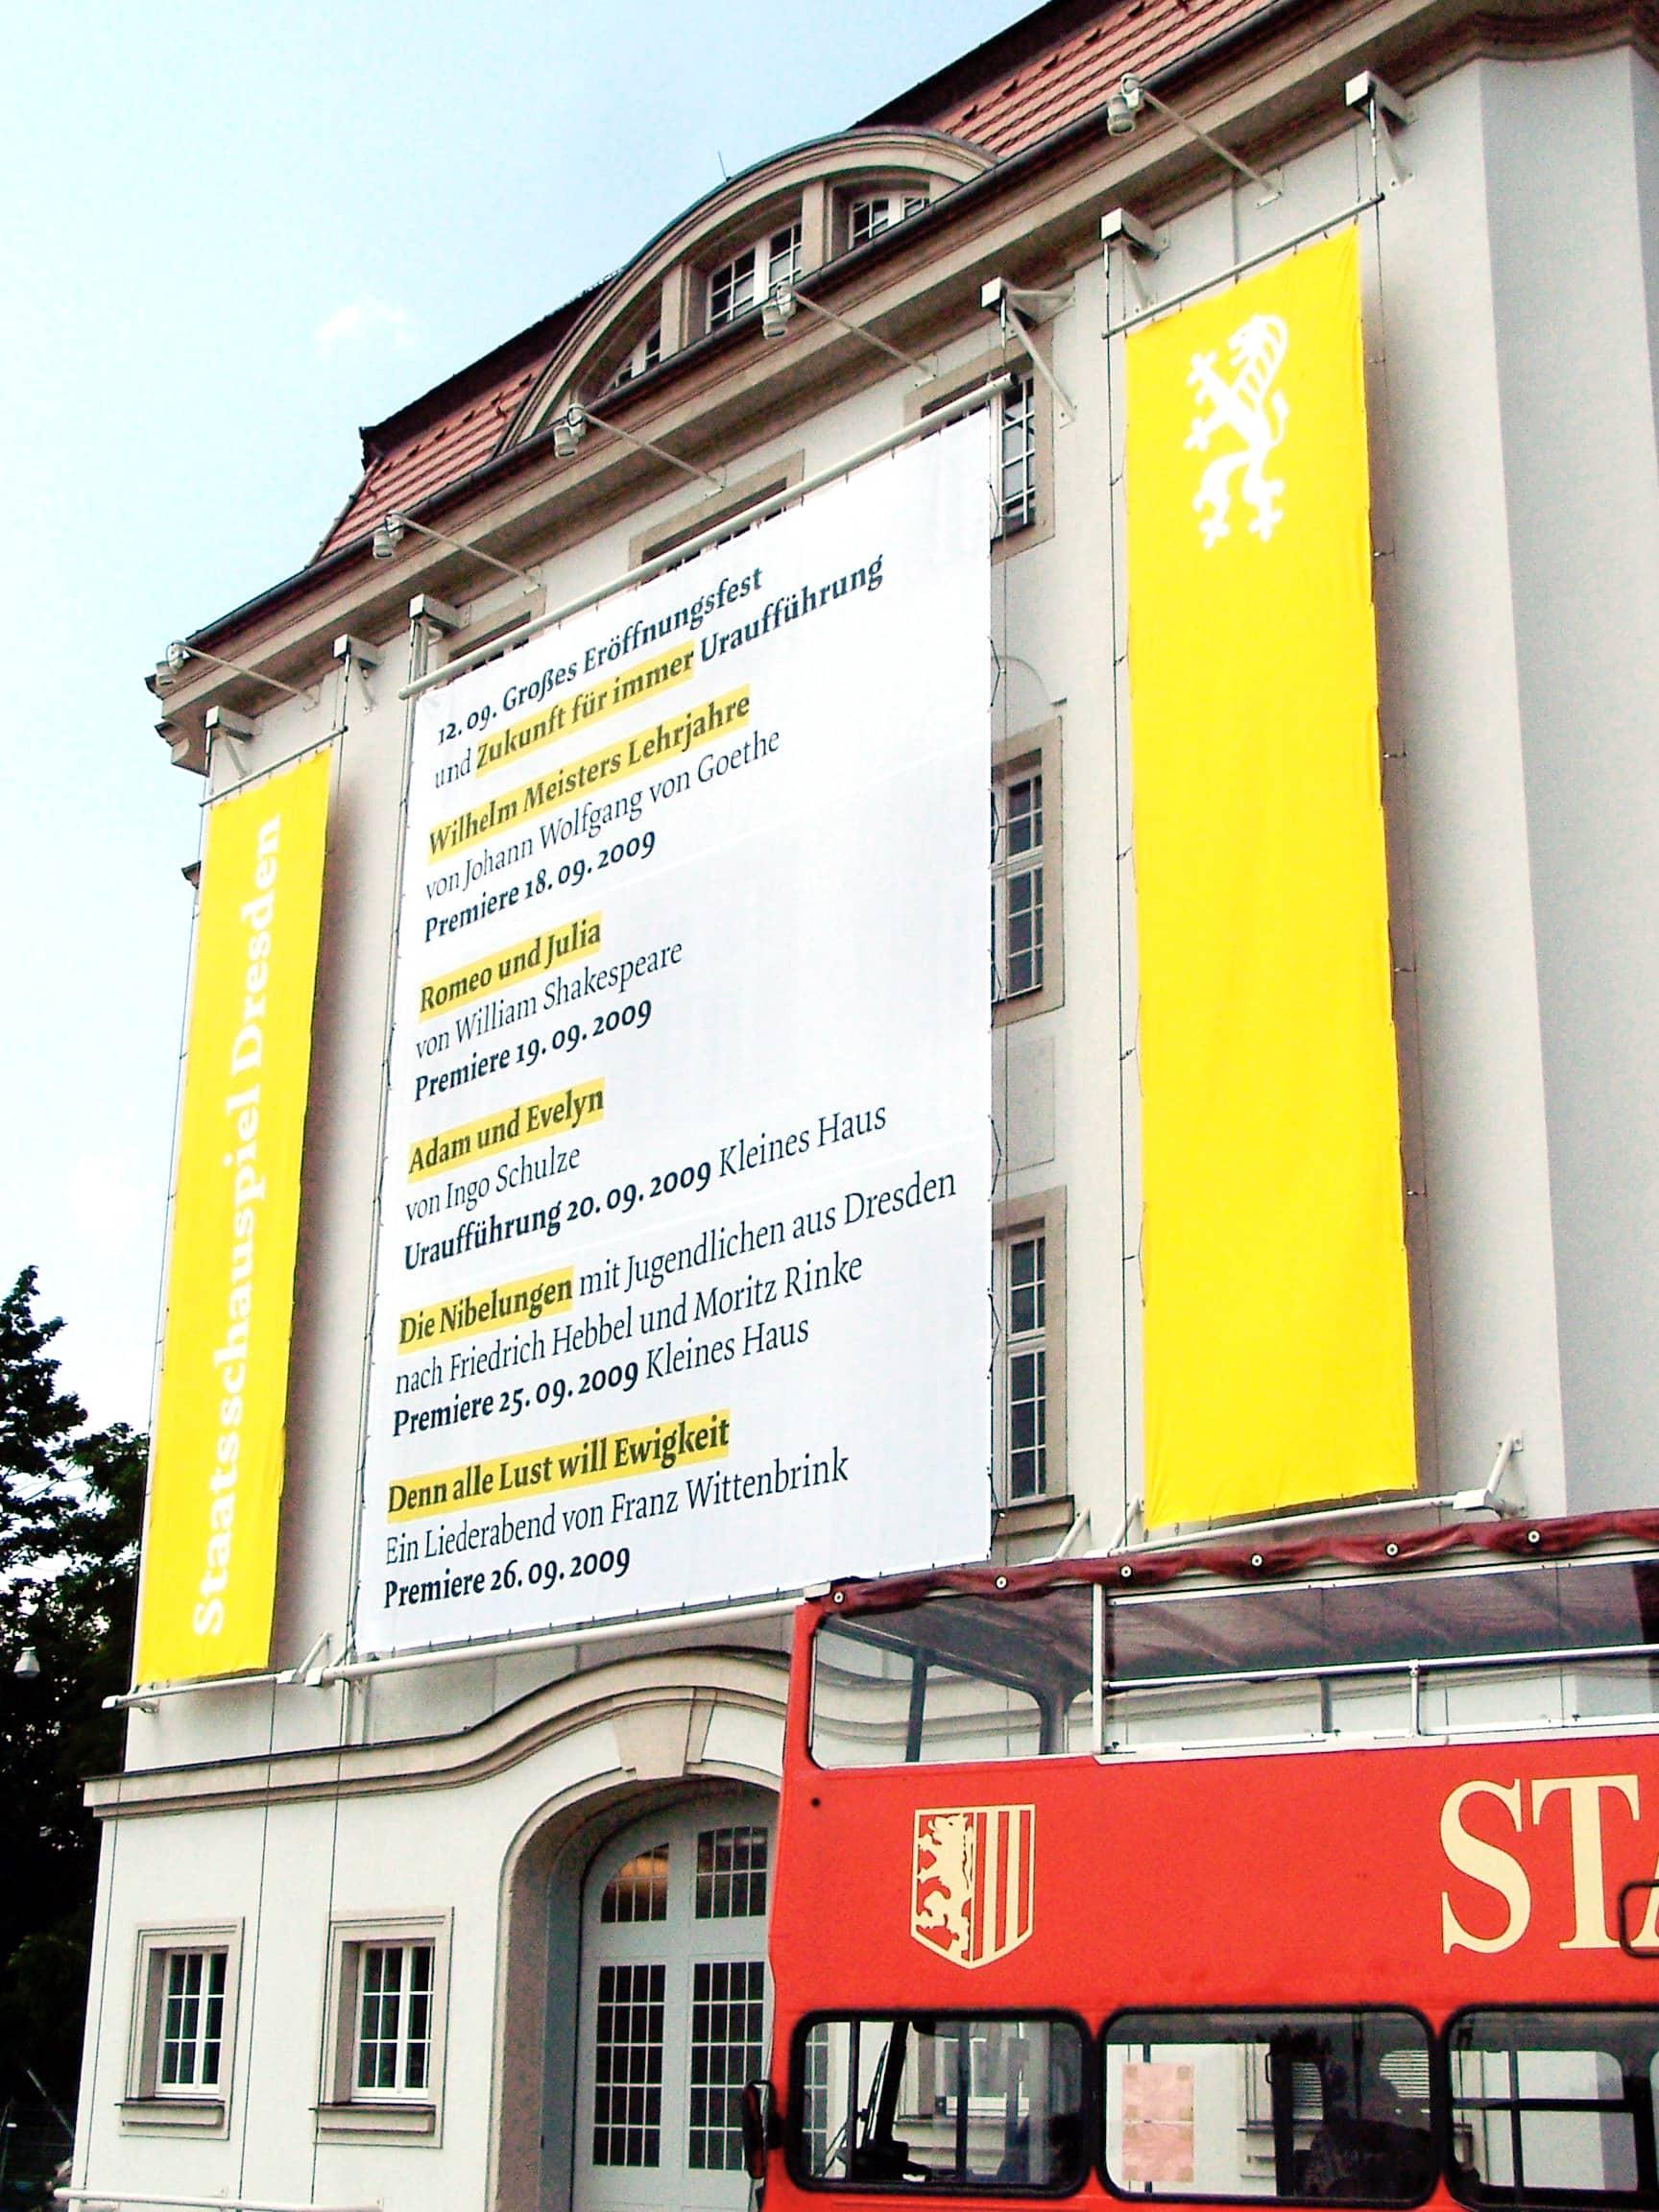 Bureau Johannes Erler – Staatsschauspiel Dresden